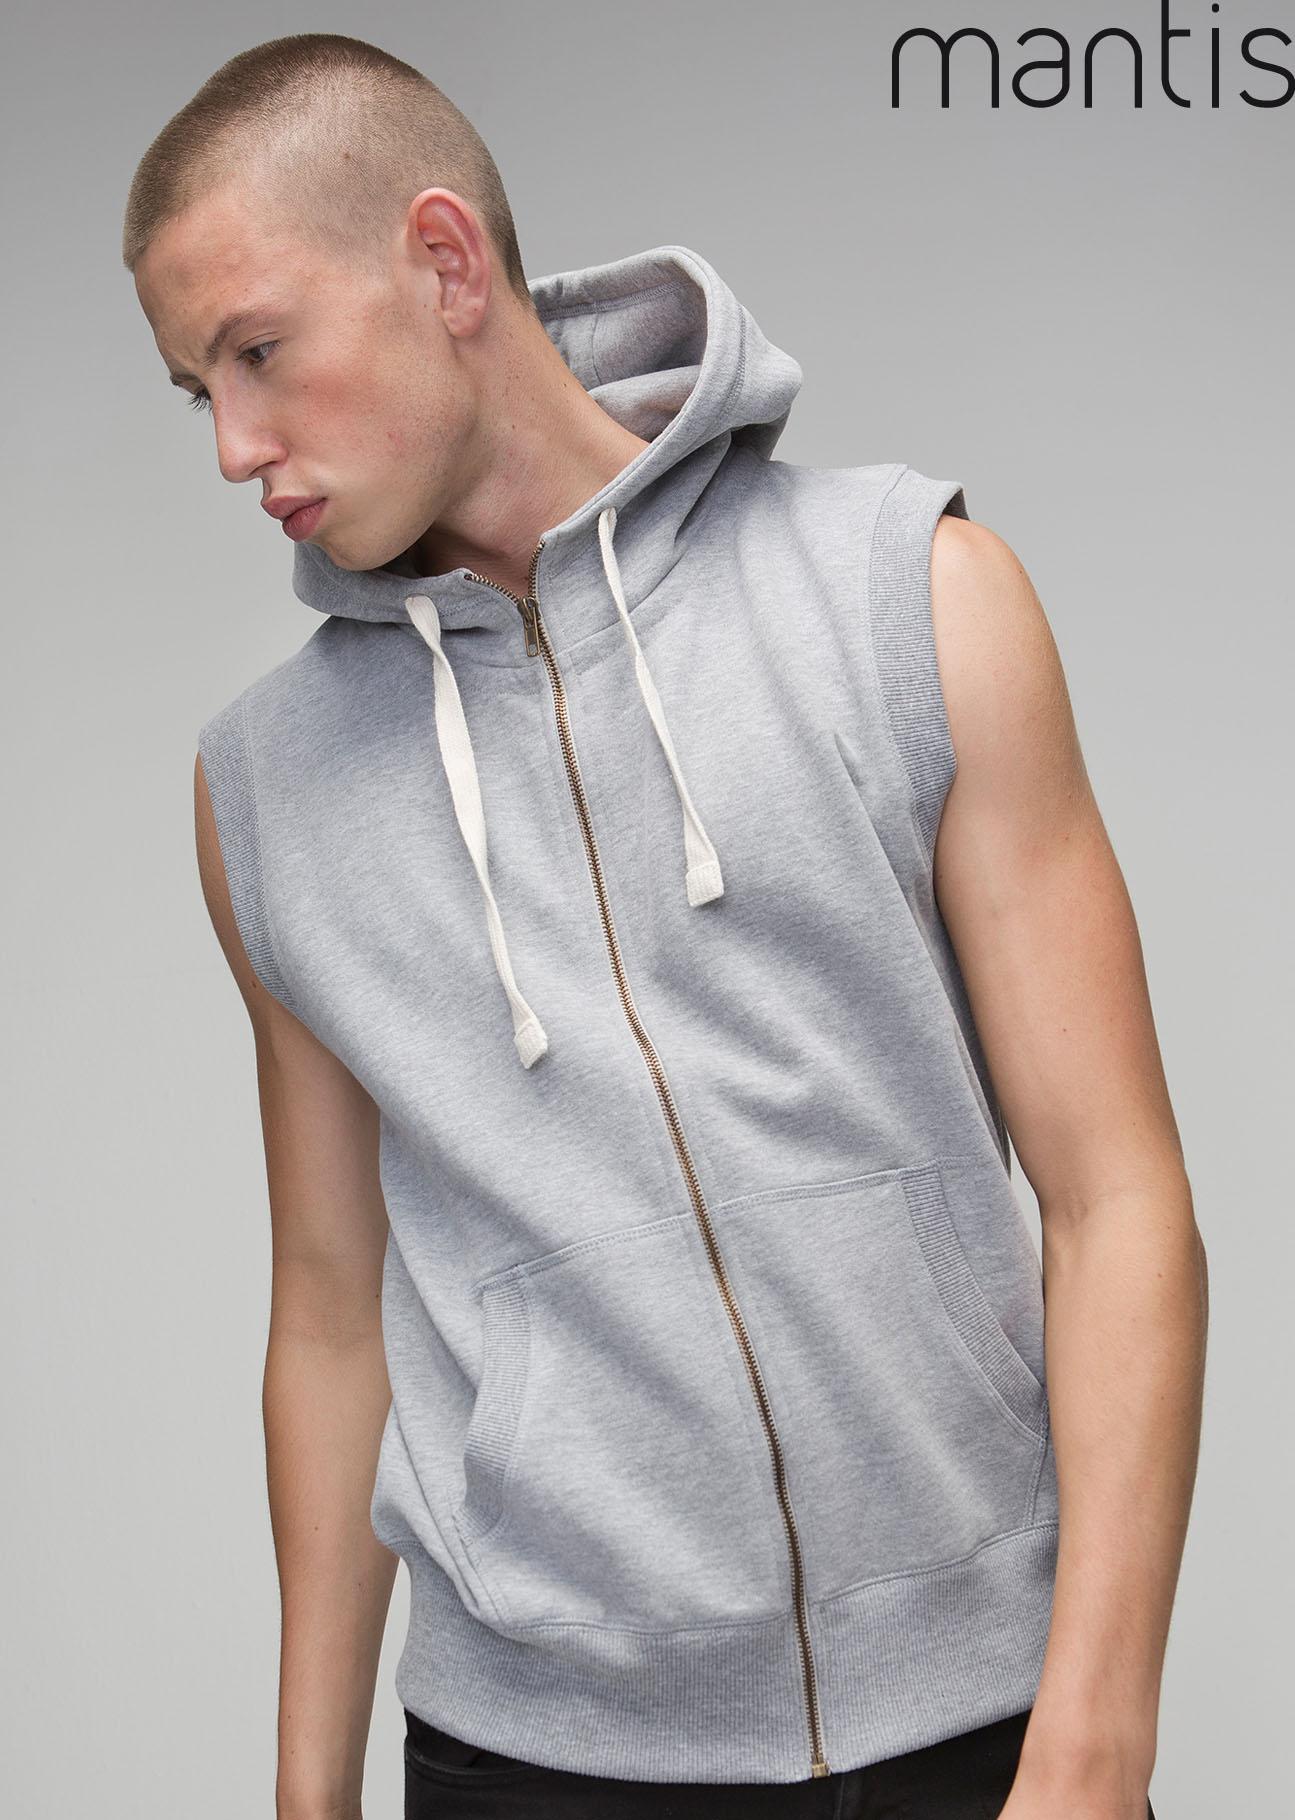 online retailer 96da2 b6aa5 Mantis, Herren Ärmellose Sweatjacke Superstar « Merkur ...